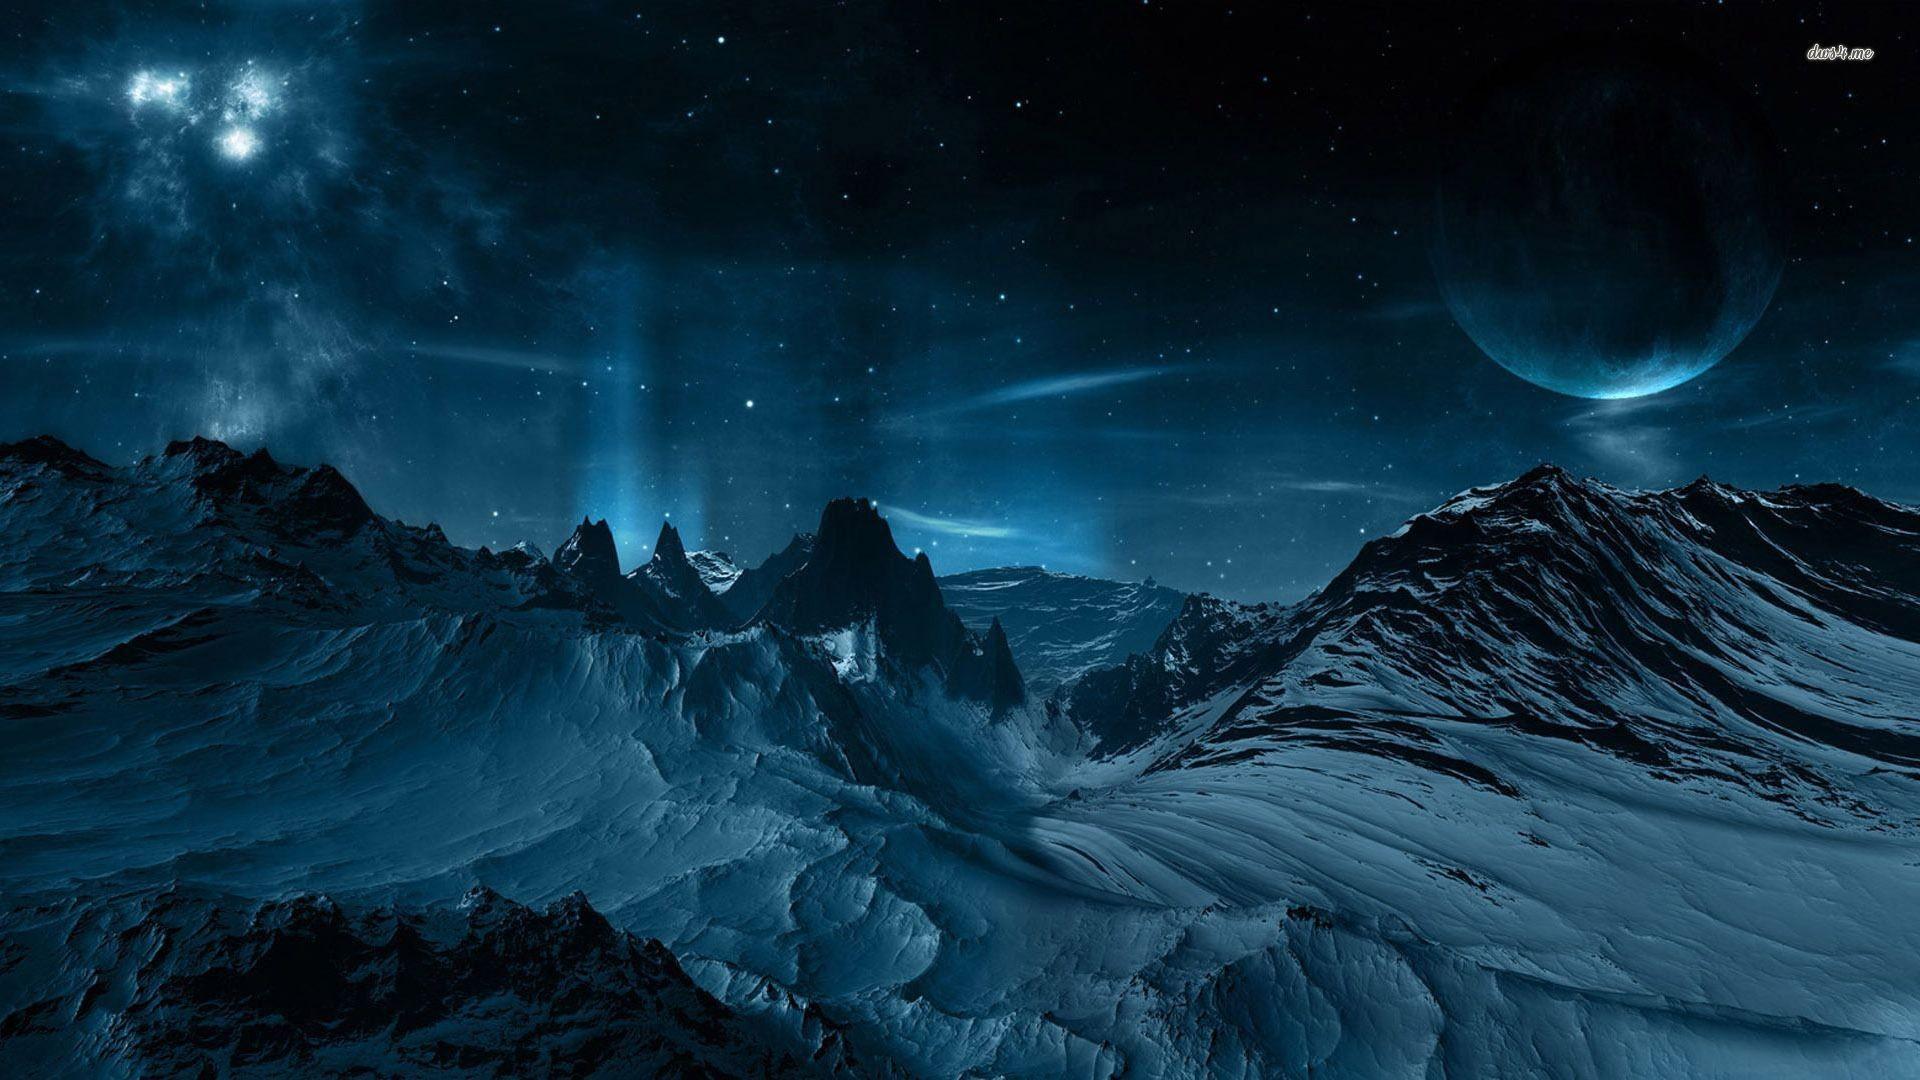 Night sky, mountain, snow, star, moon, fantasy, HD .